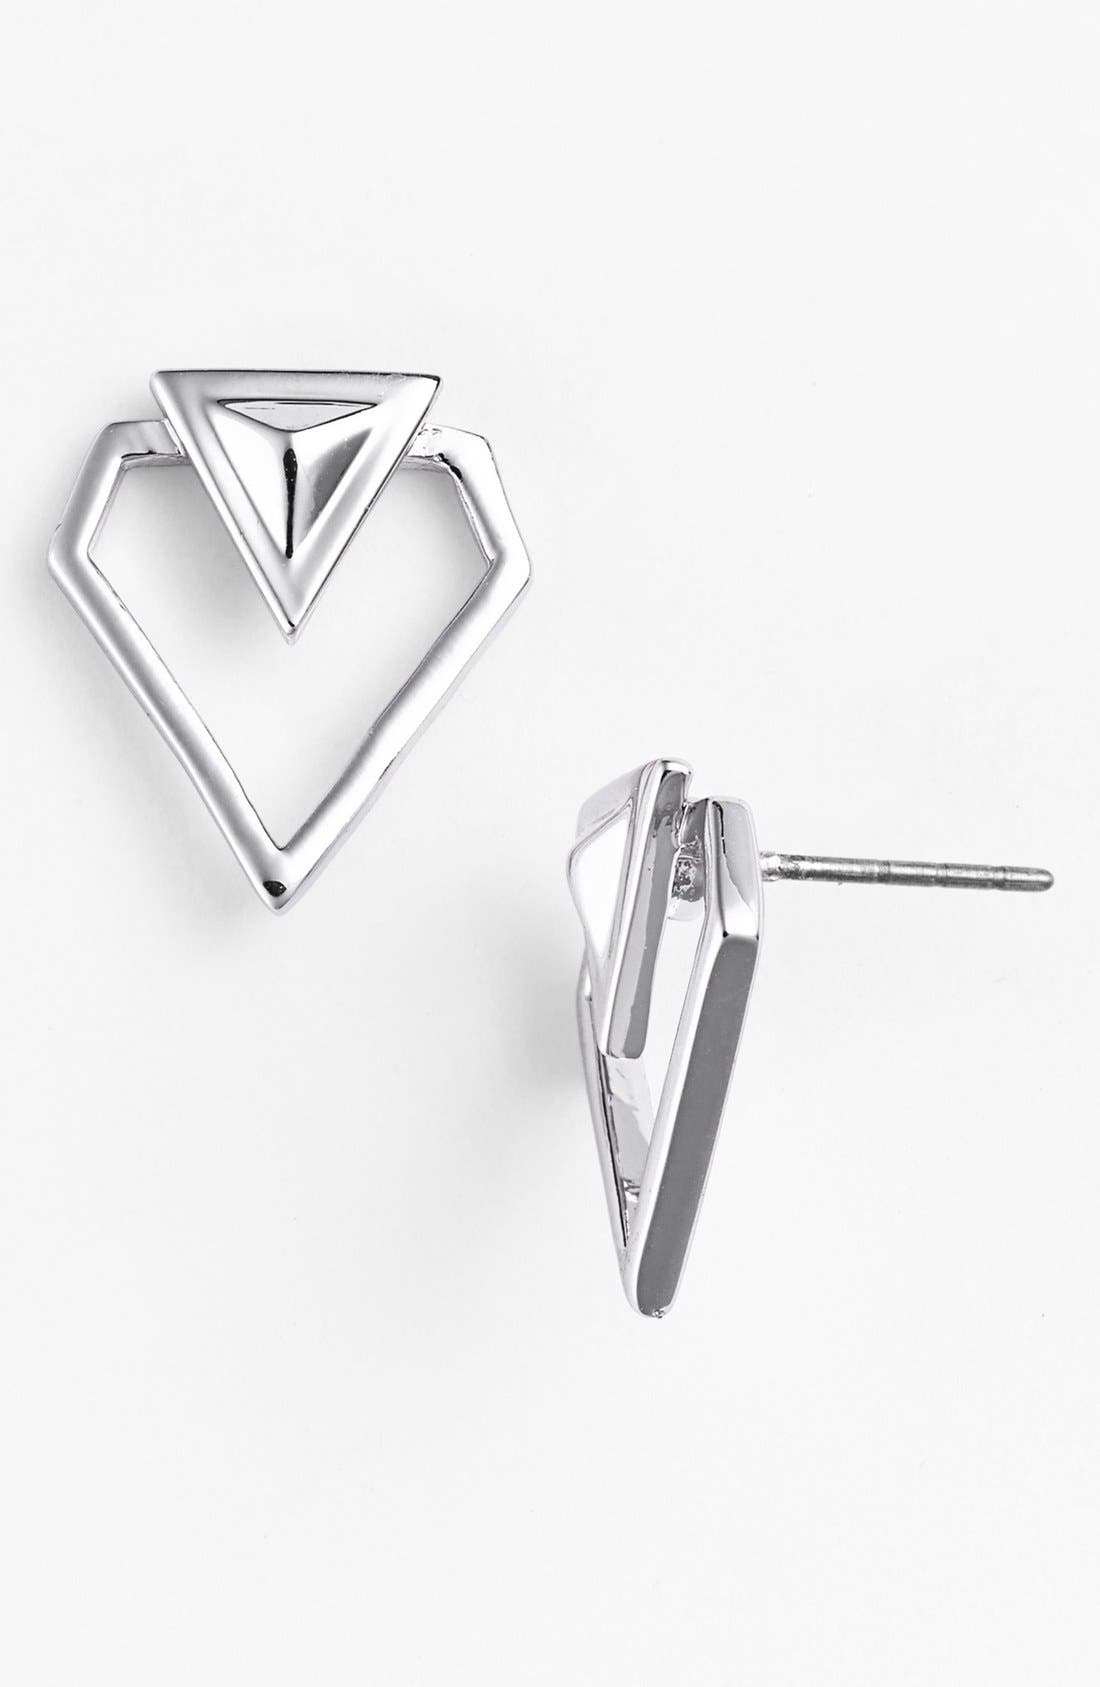 Main Image - Rebecca Minkoff 'Blades' Open Stud Earrings